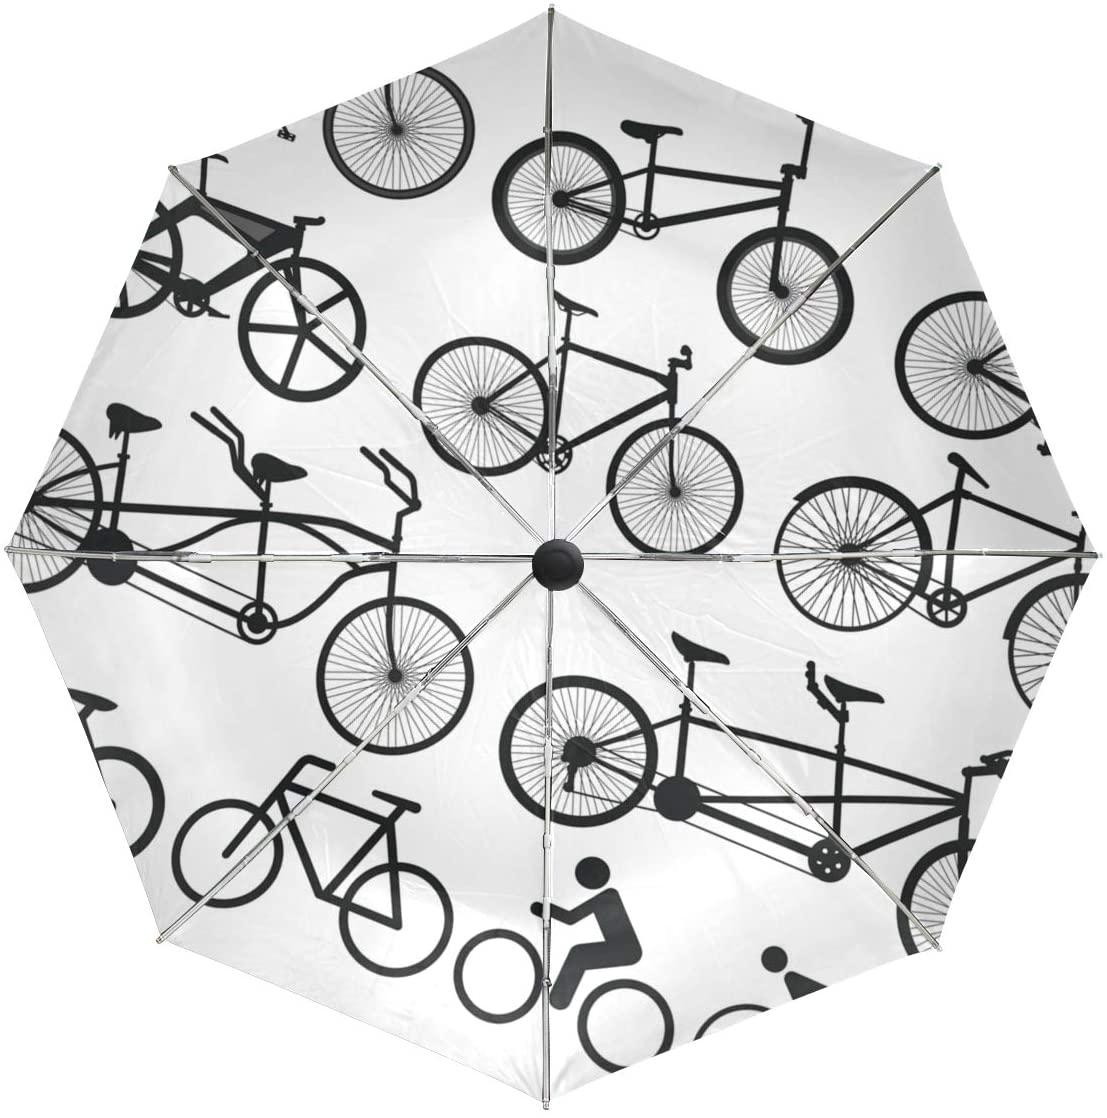 Senuu Black White Bike Umbrella Large Travel Auto Open Close Sun Blocking Umbrellas for Women Men